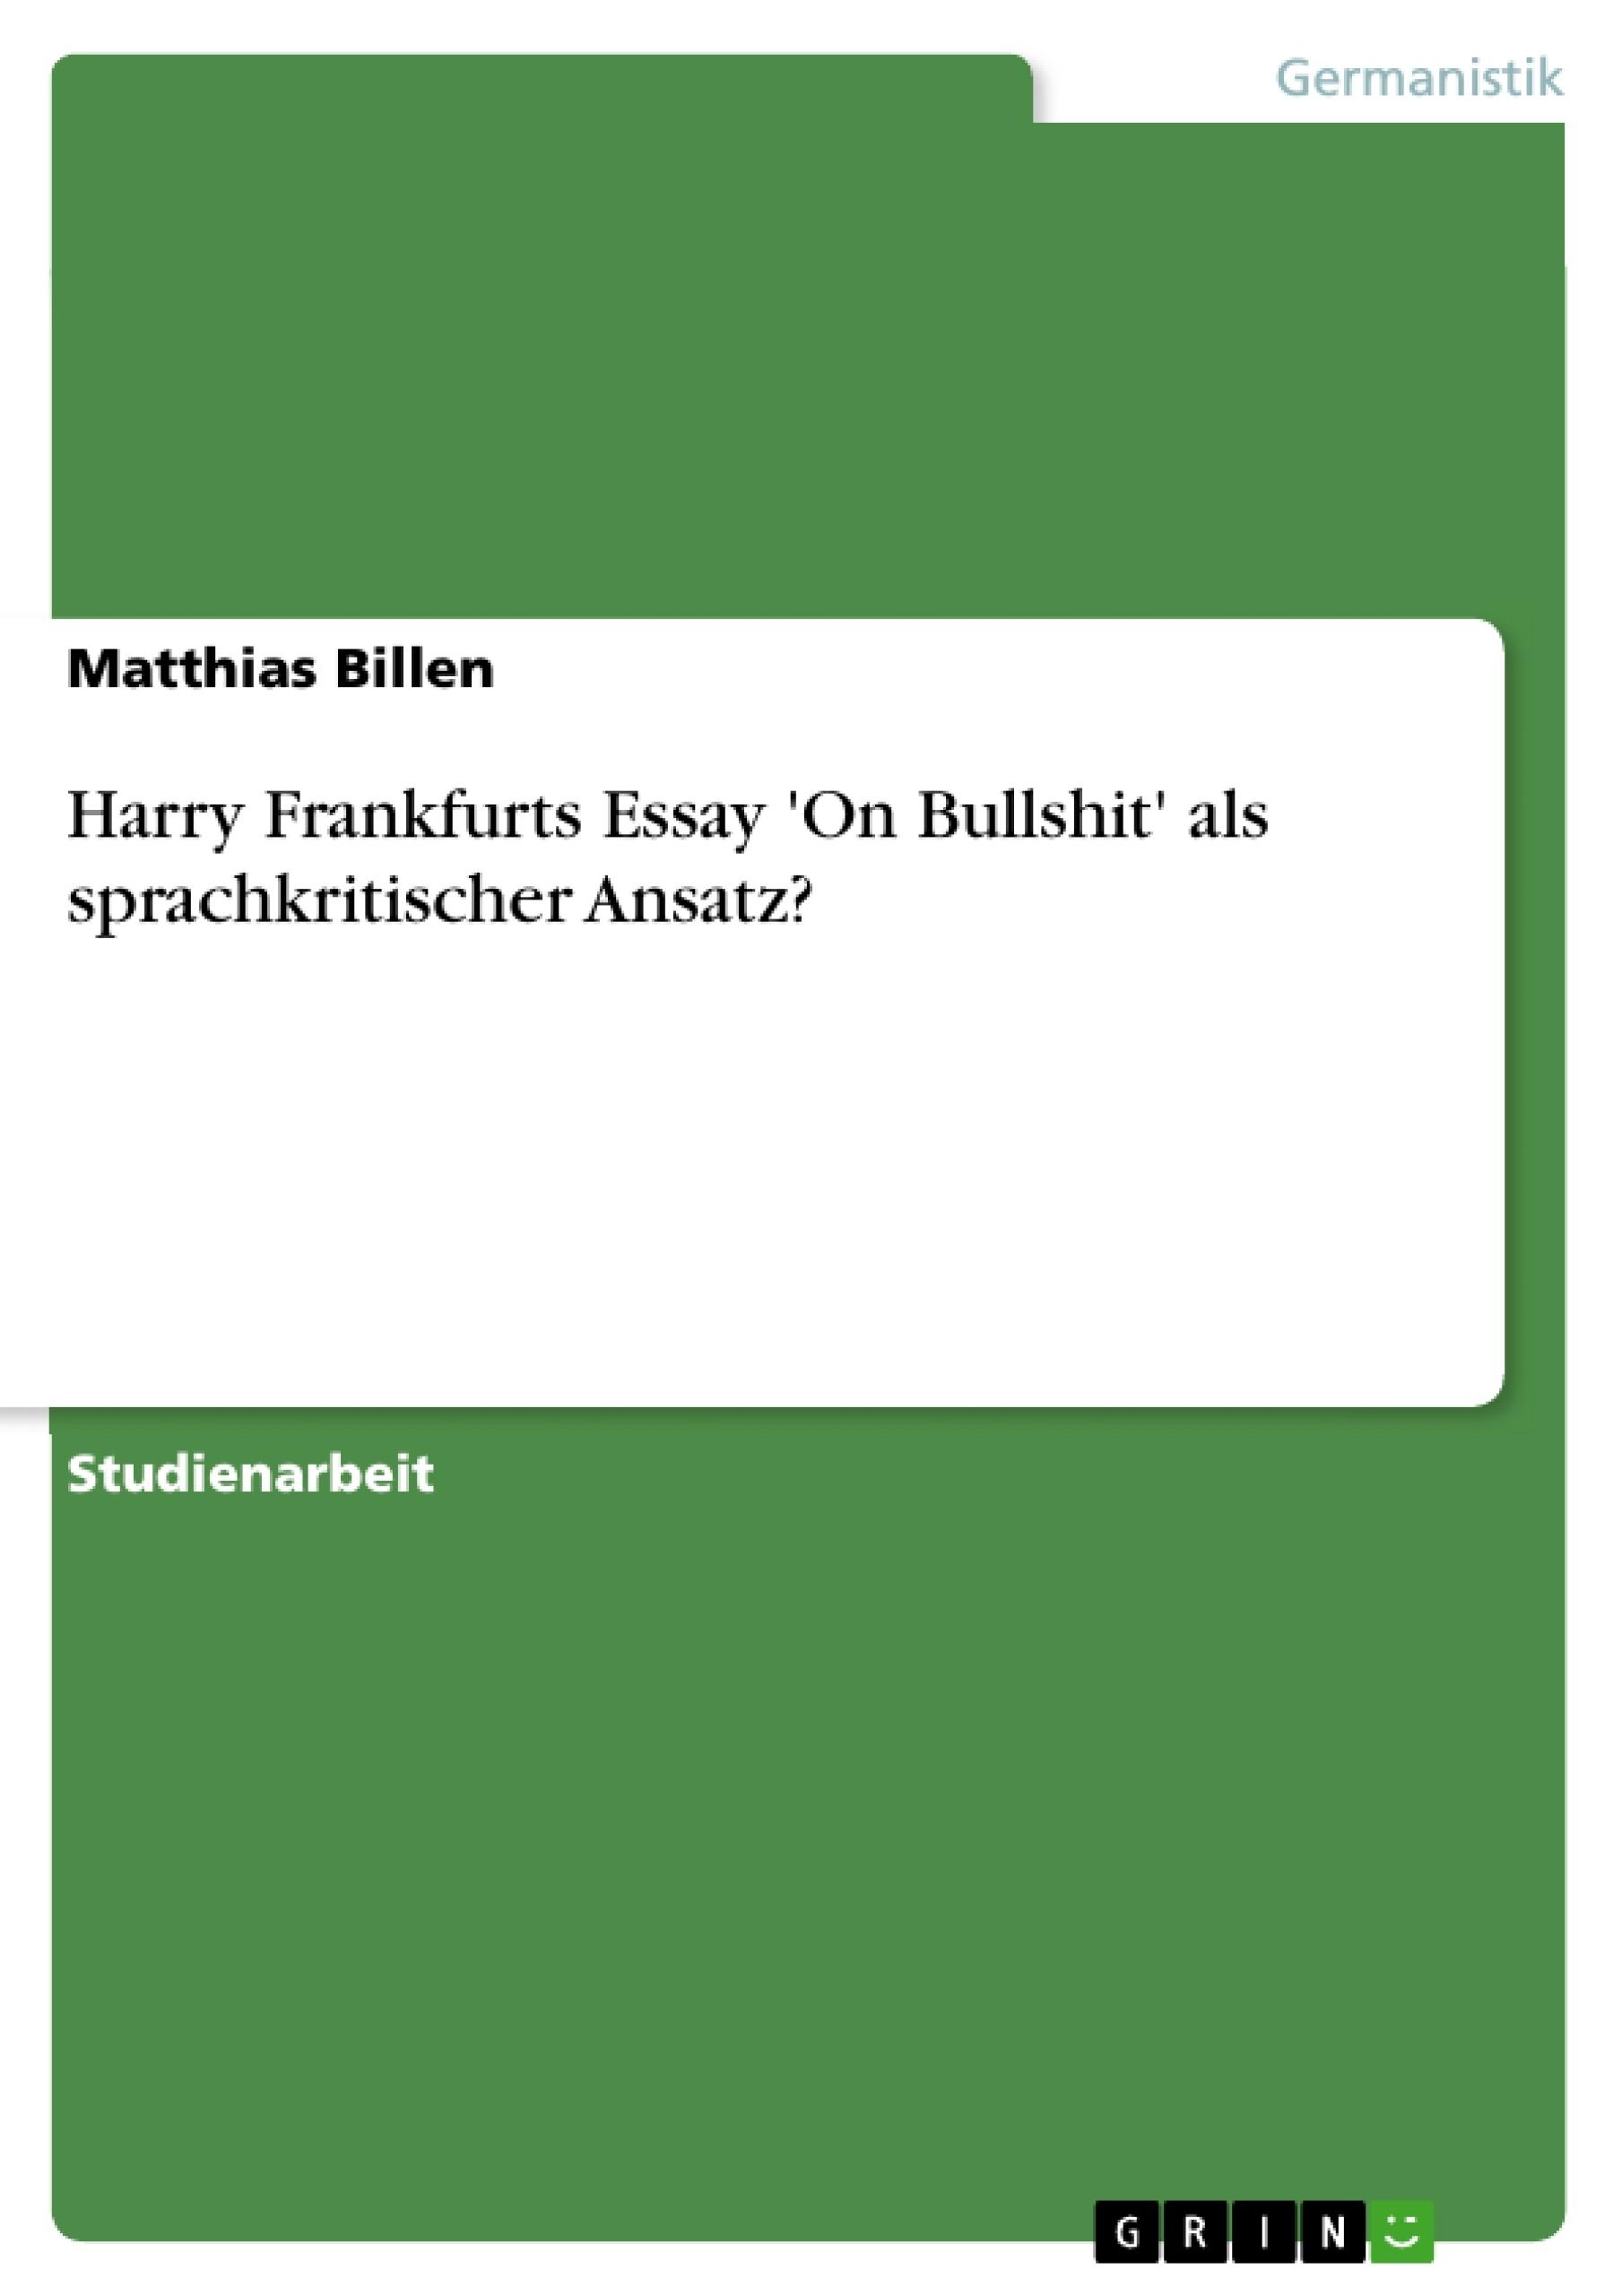 Titel: Harry Frankfurts Essay 'On Bullshit' als sprachkritischer Ansatz?